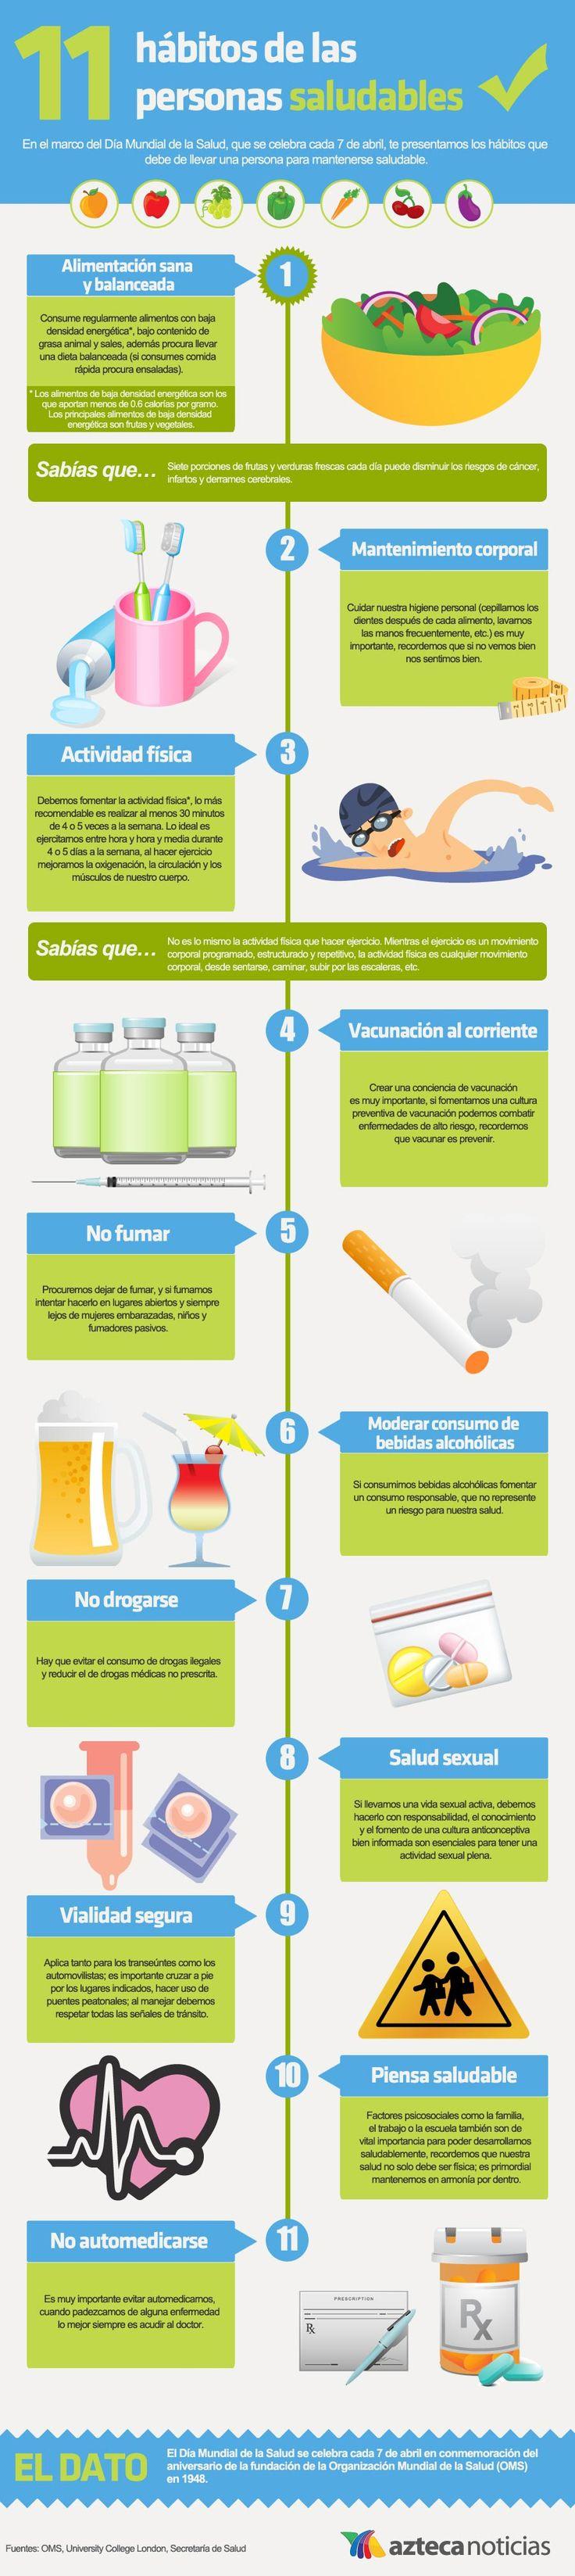 11 hábitos de las personas saludables #Infografia